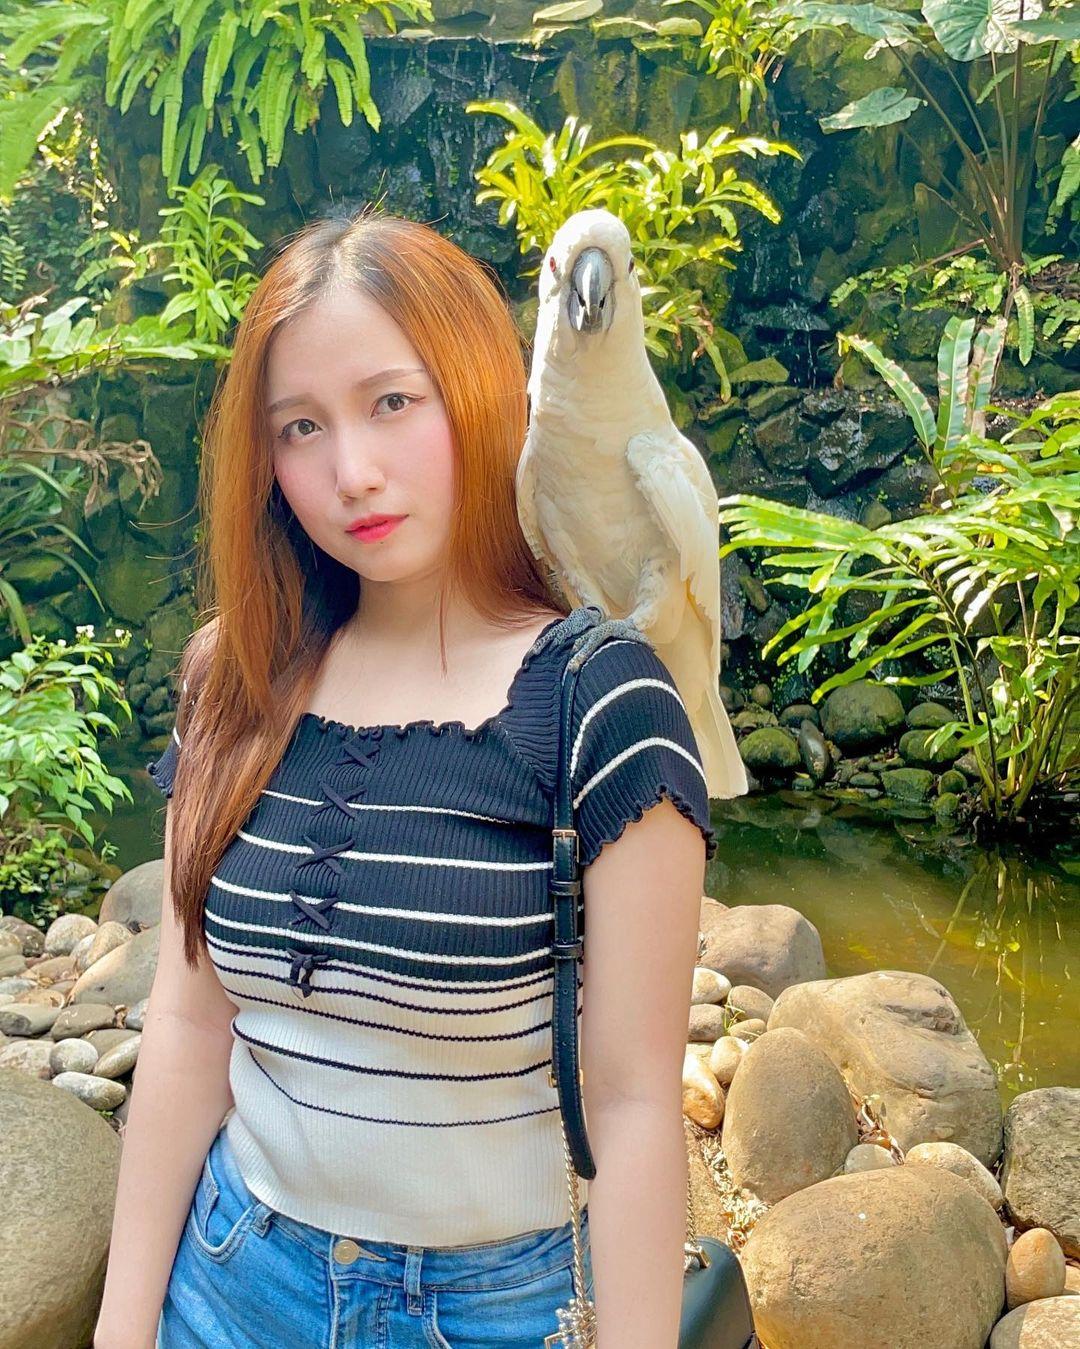 Berfoto Dengan Burung Kakatua Di Faunaland Ancol Image From @evy_christina